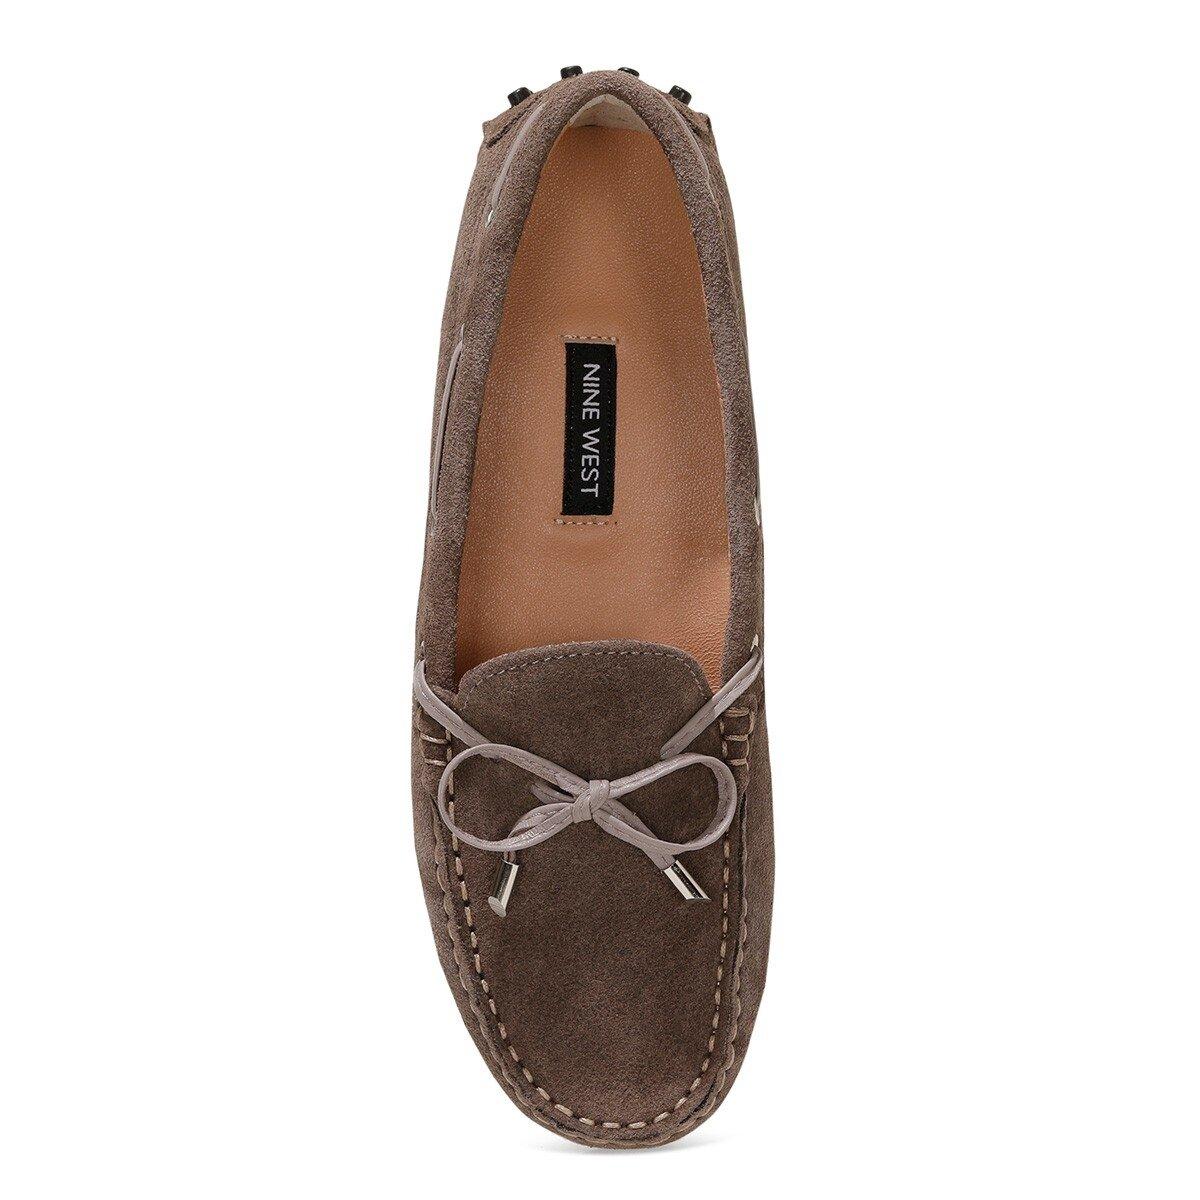 NEWHOLT2 1FX Gri Kadın Loafer